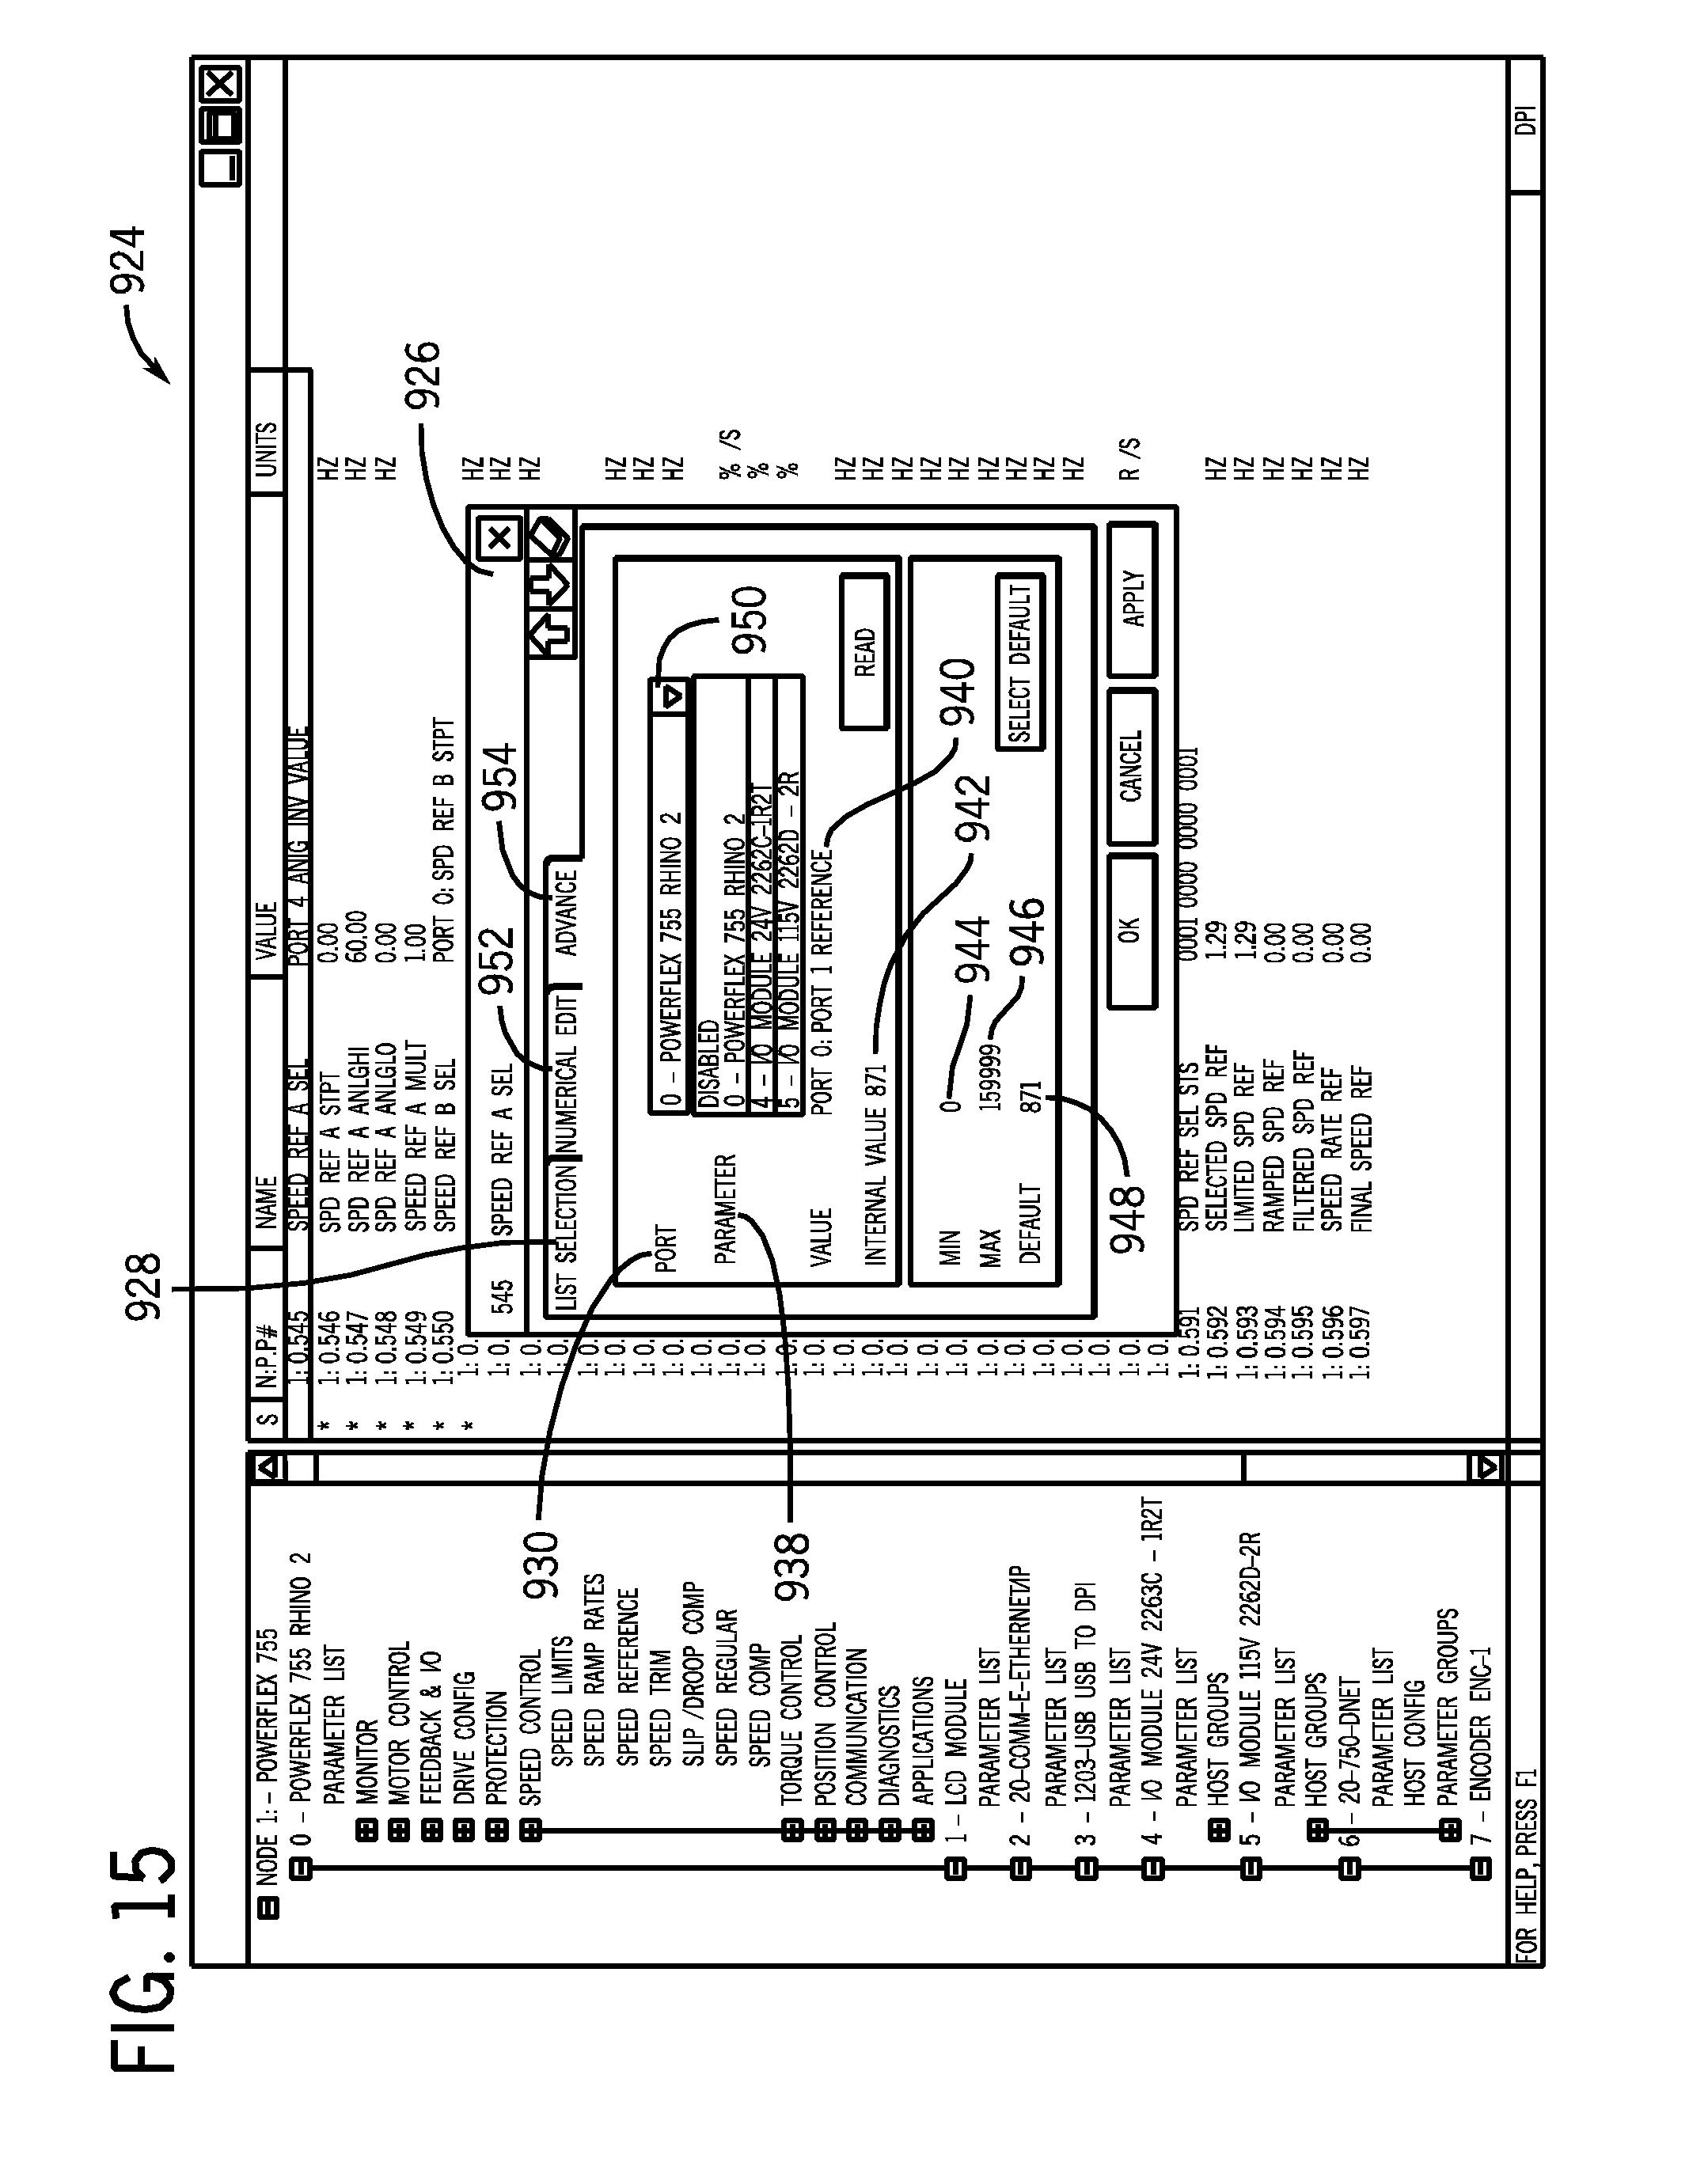 Powerflex 525 Wiring Diagram from diagramweb.net